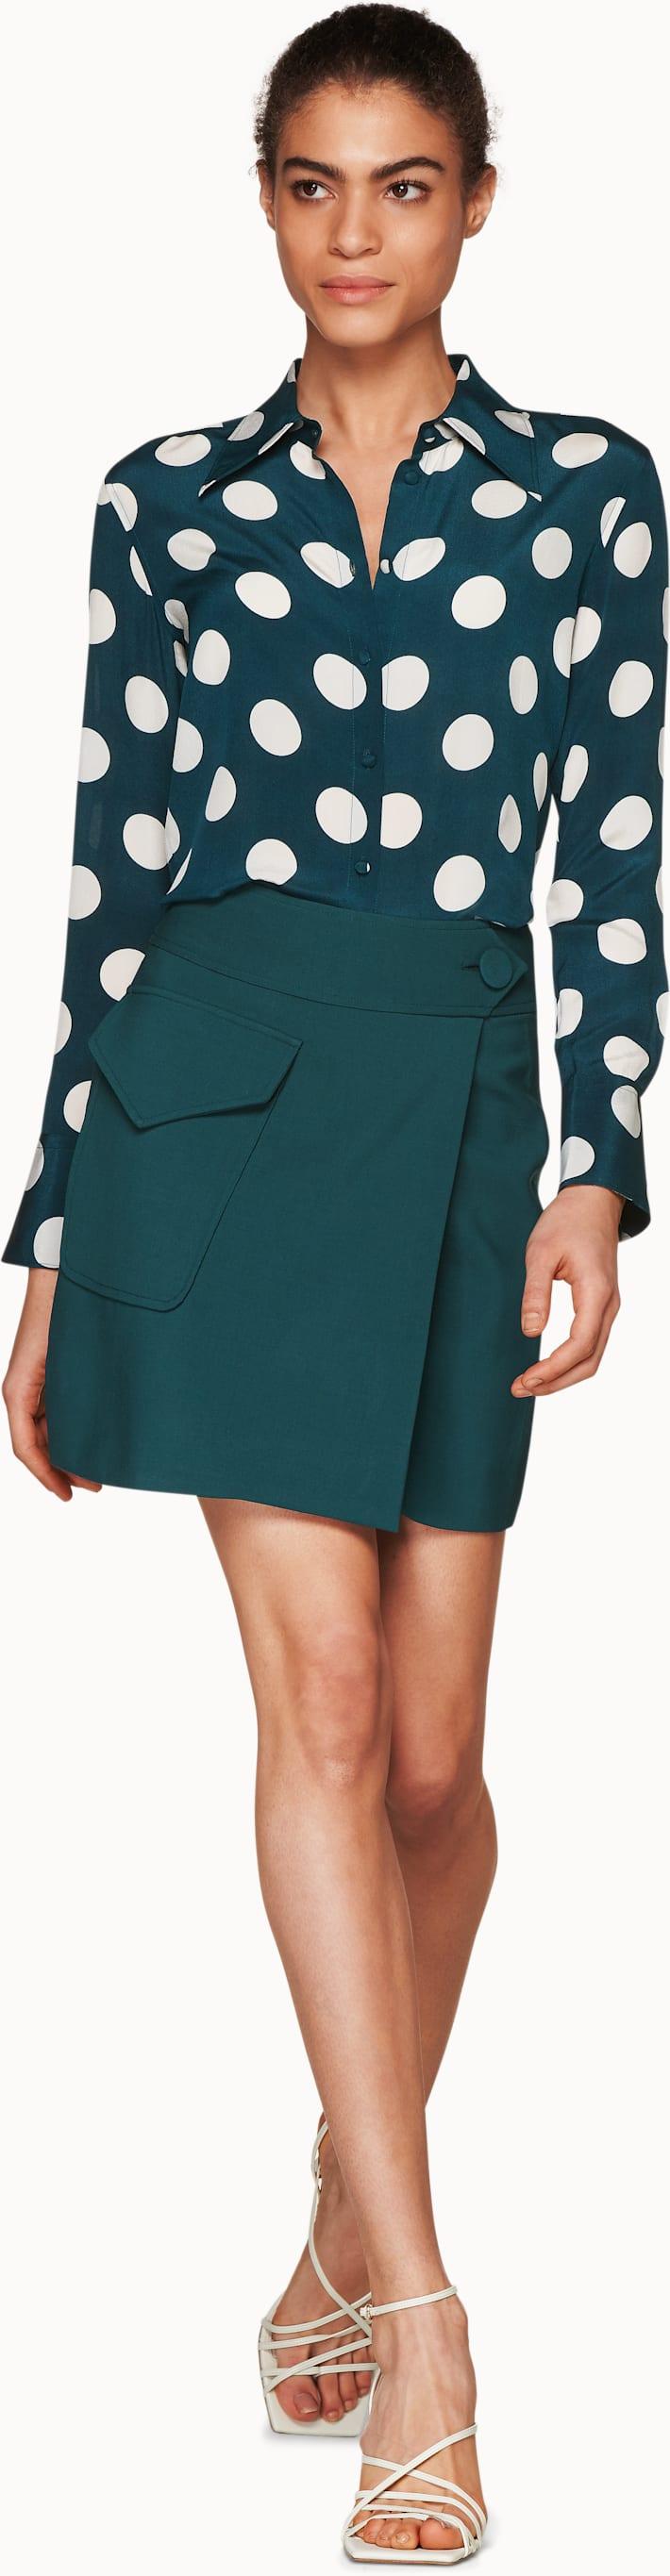 Darwin Teal  Skirt